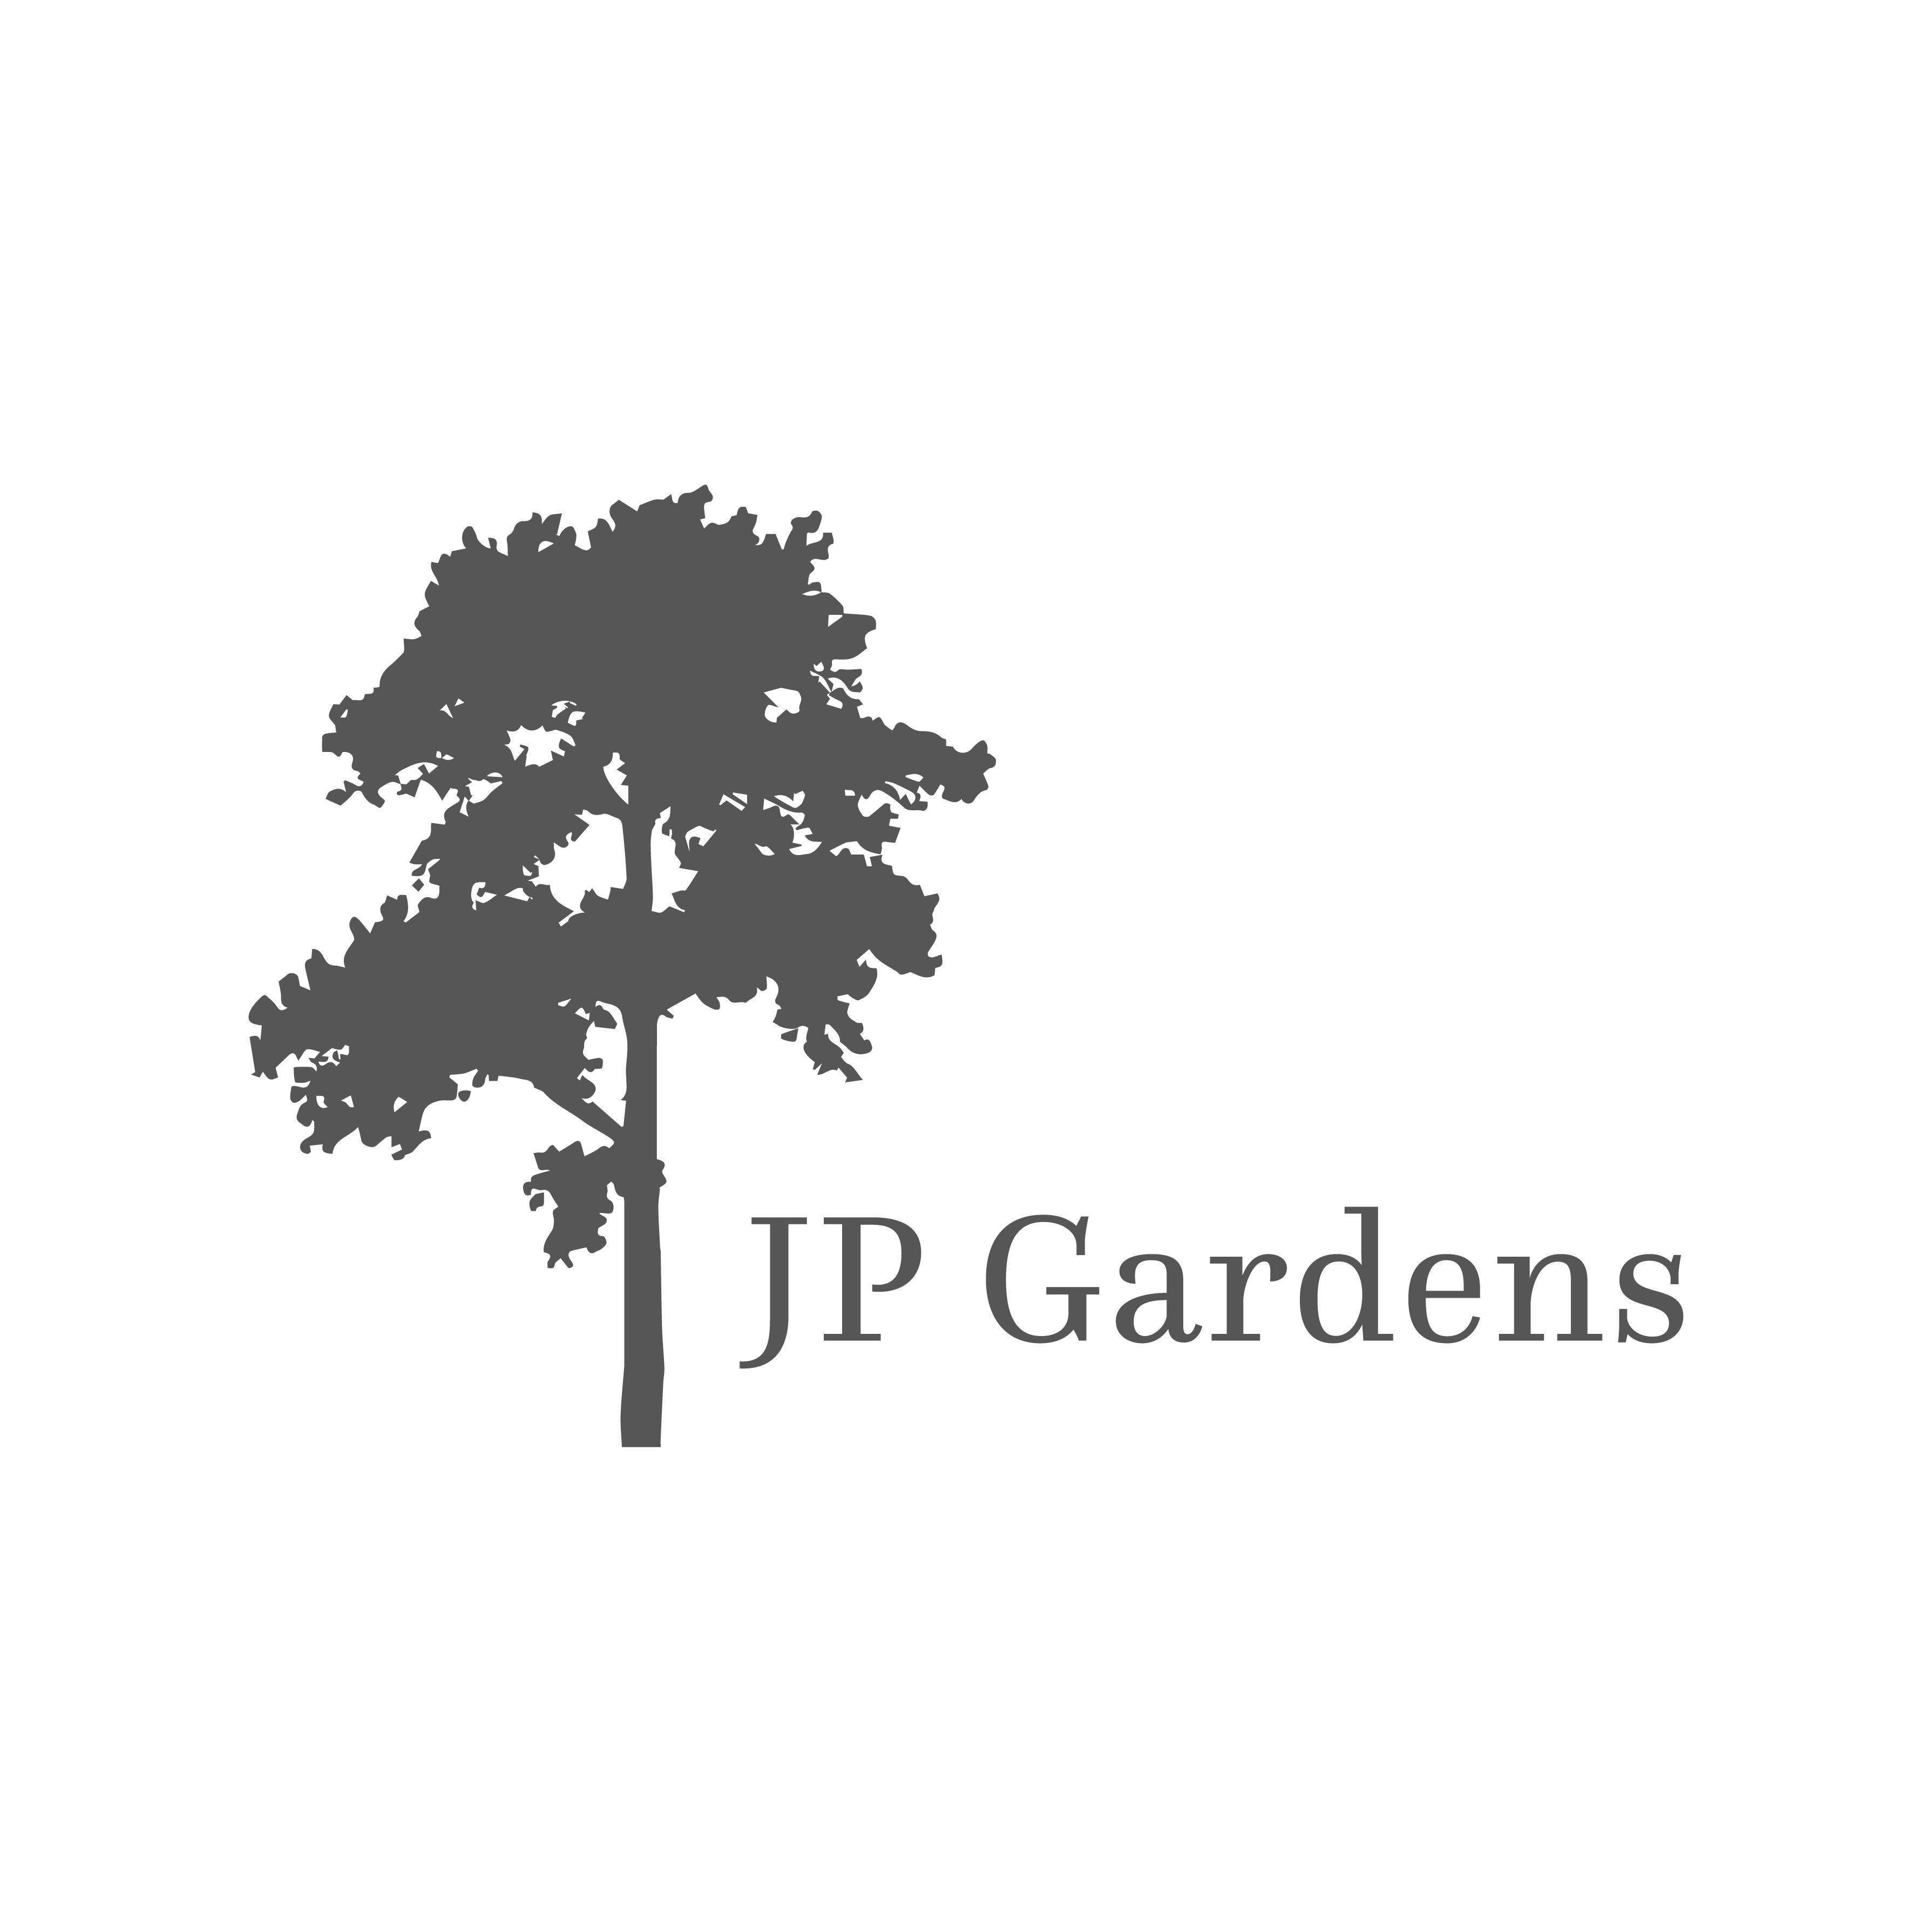 JP Gardens